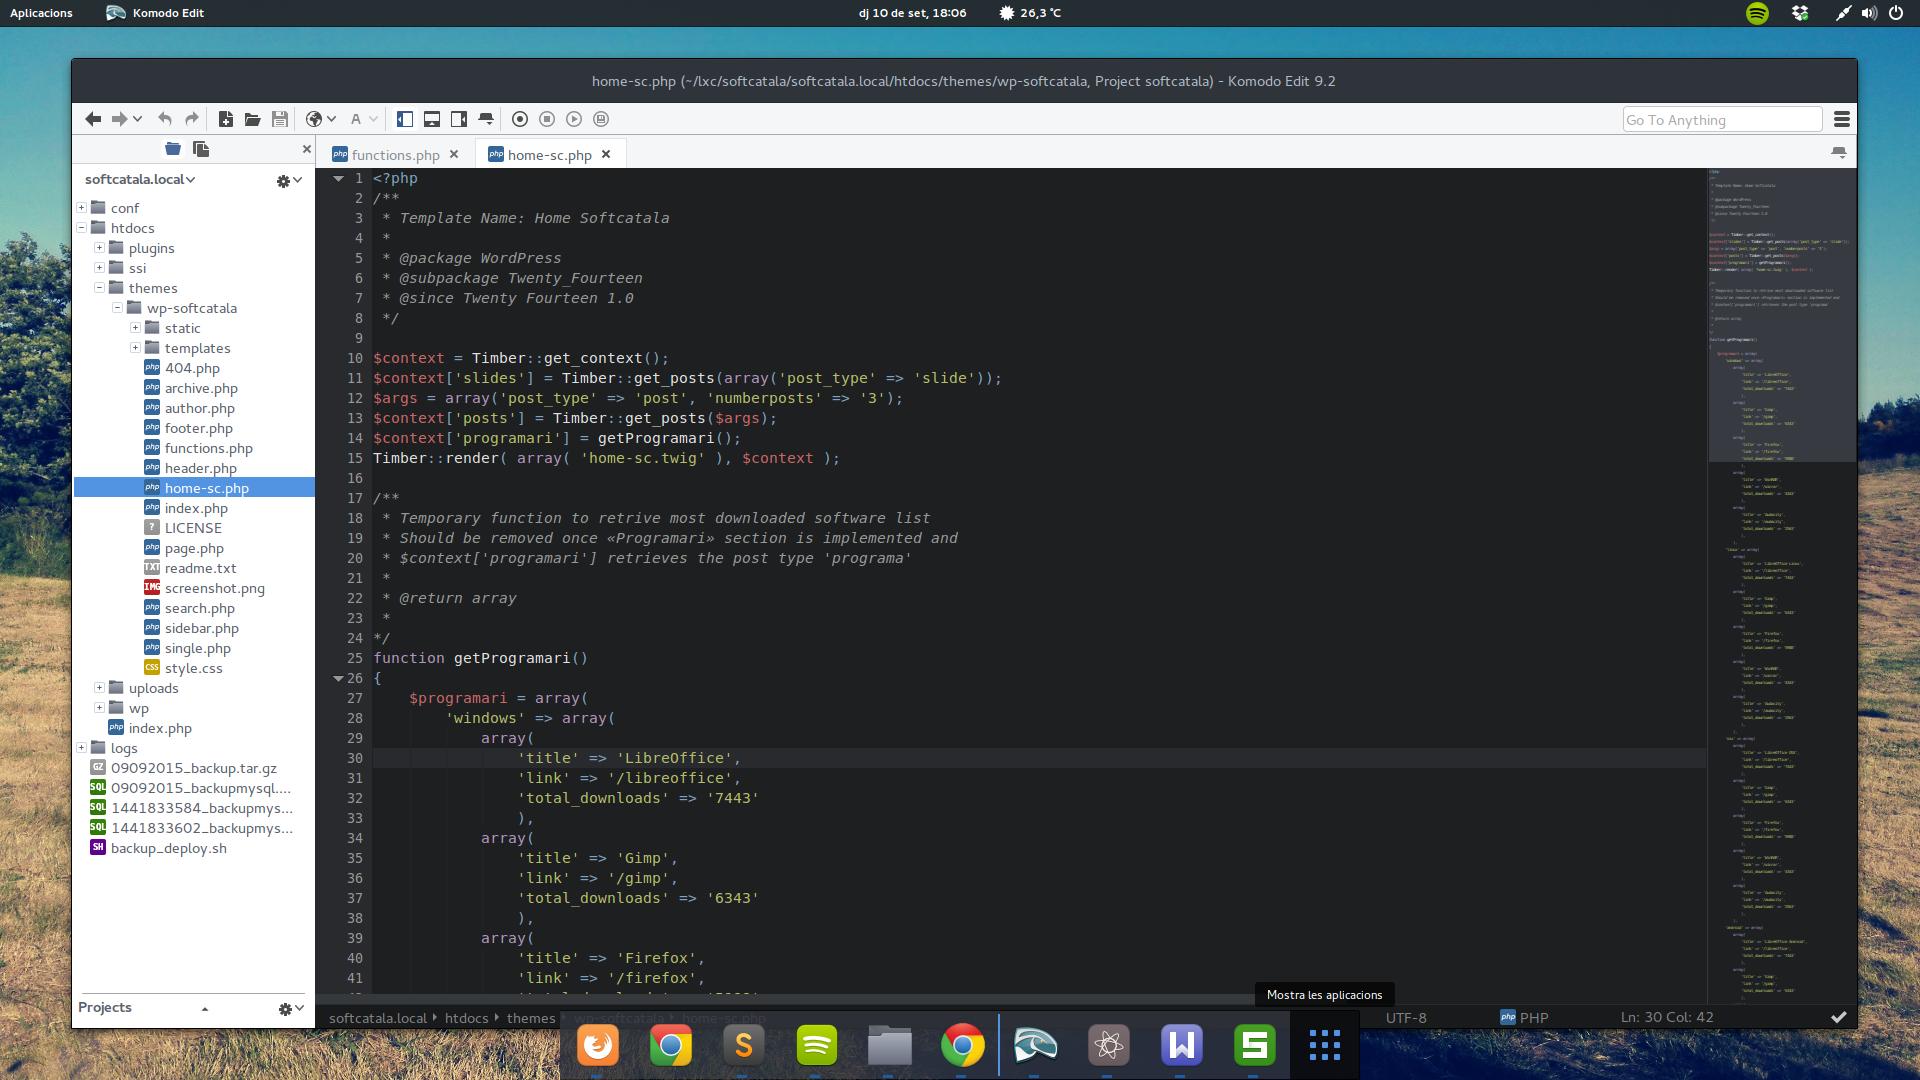 Komodo Edit 9.2